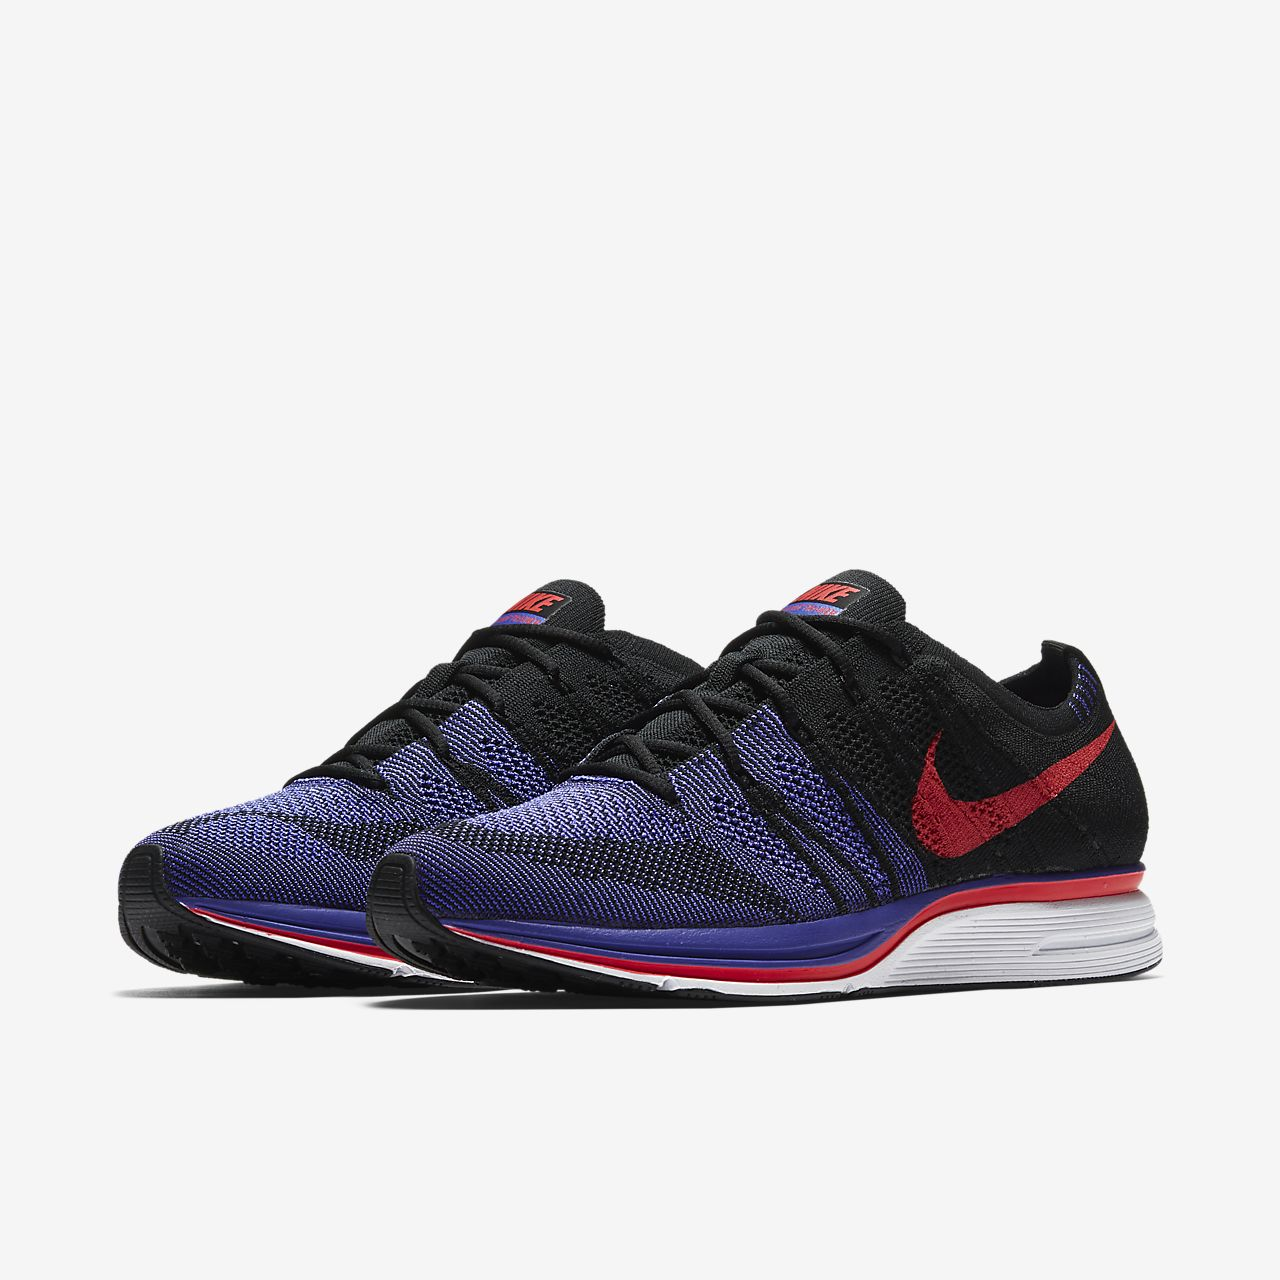 wholesale dealer ad64d bf536 Nike Flyknit Trainer Unisex Shoe. Nike.com GB